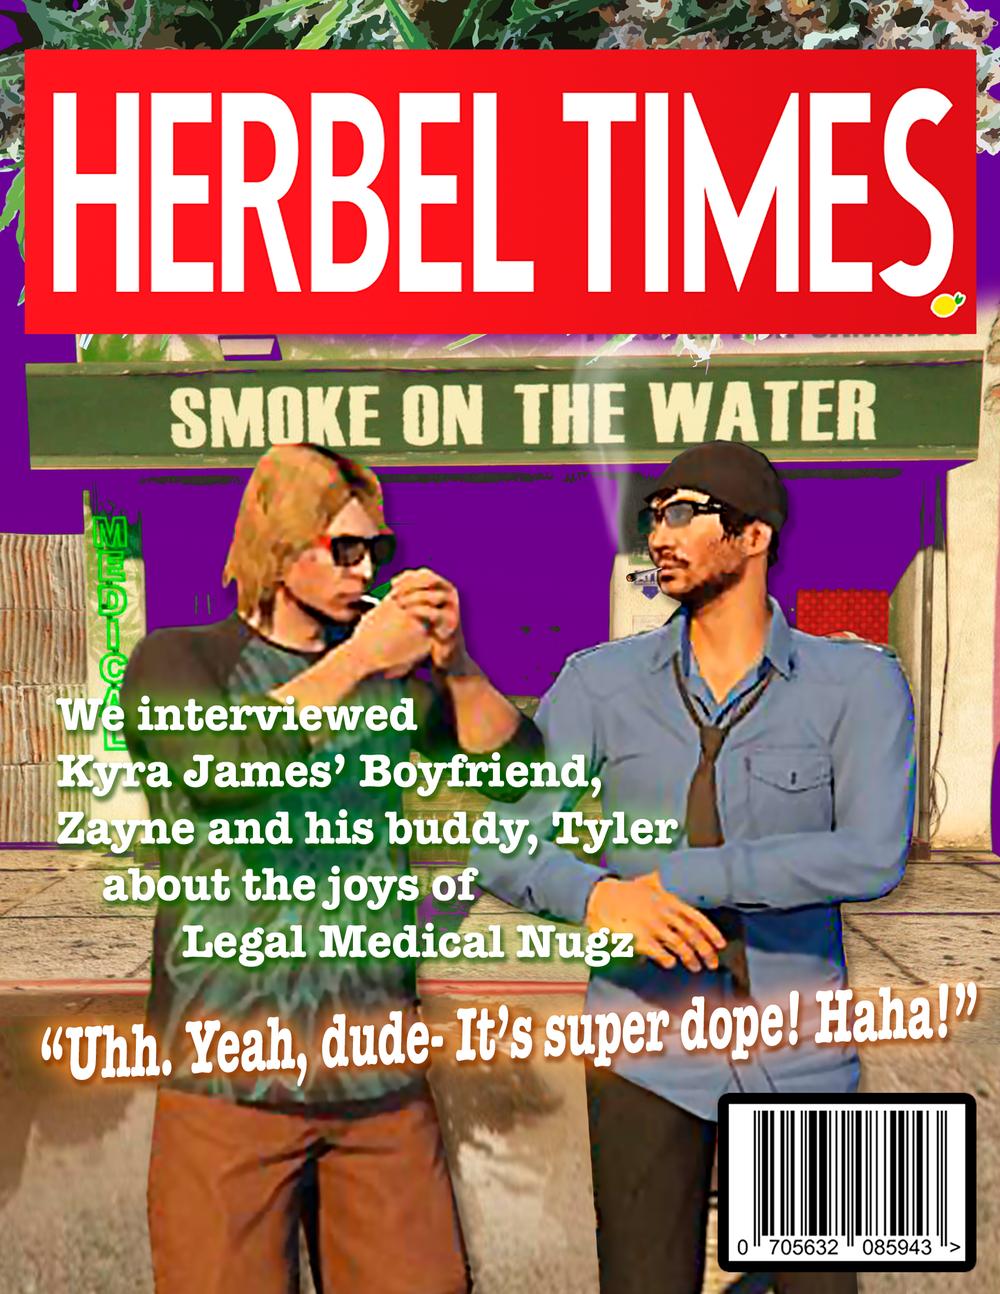 HerbelTimes_4.png